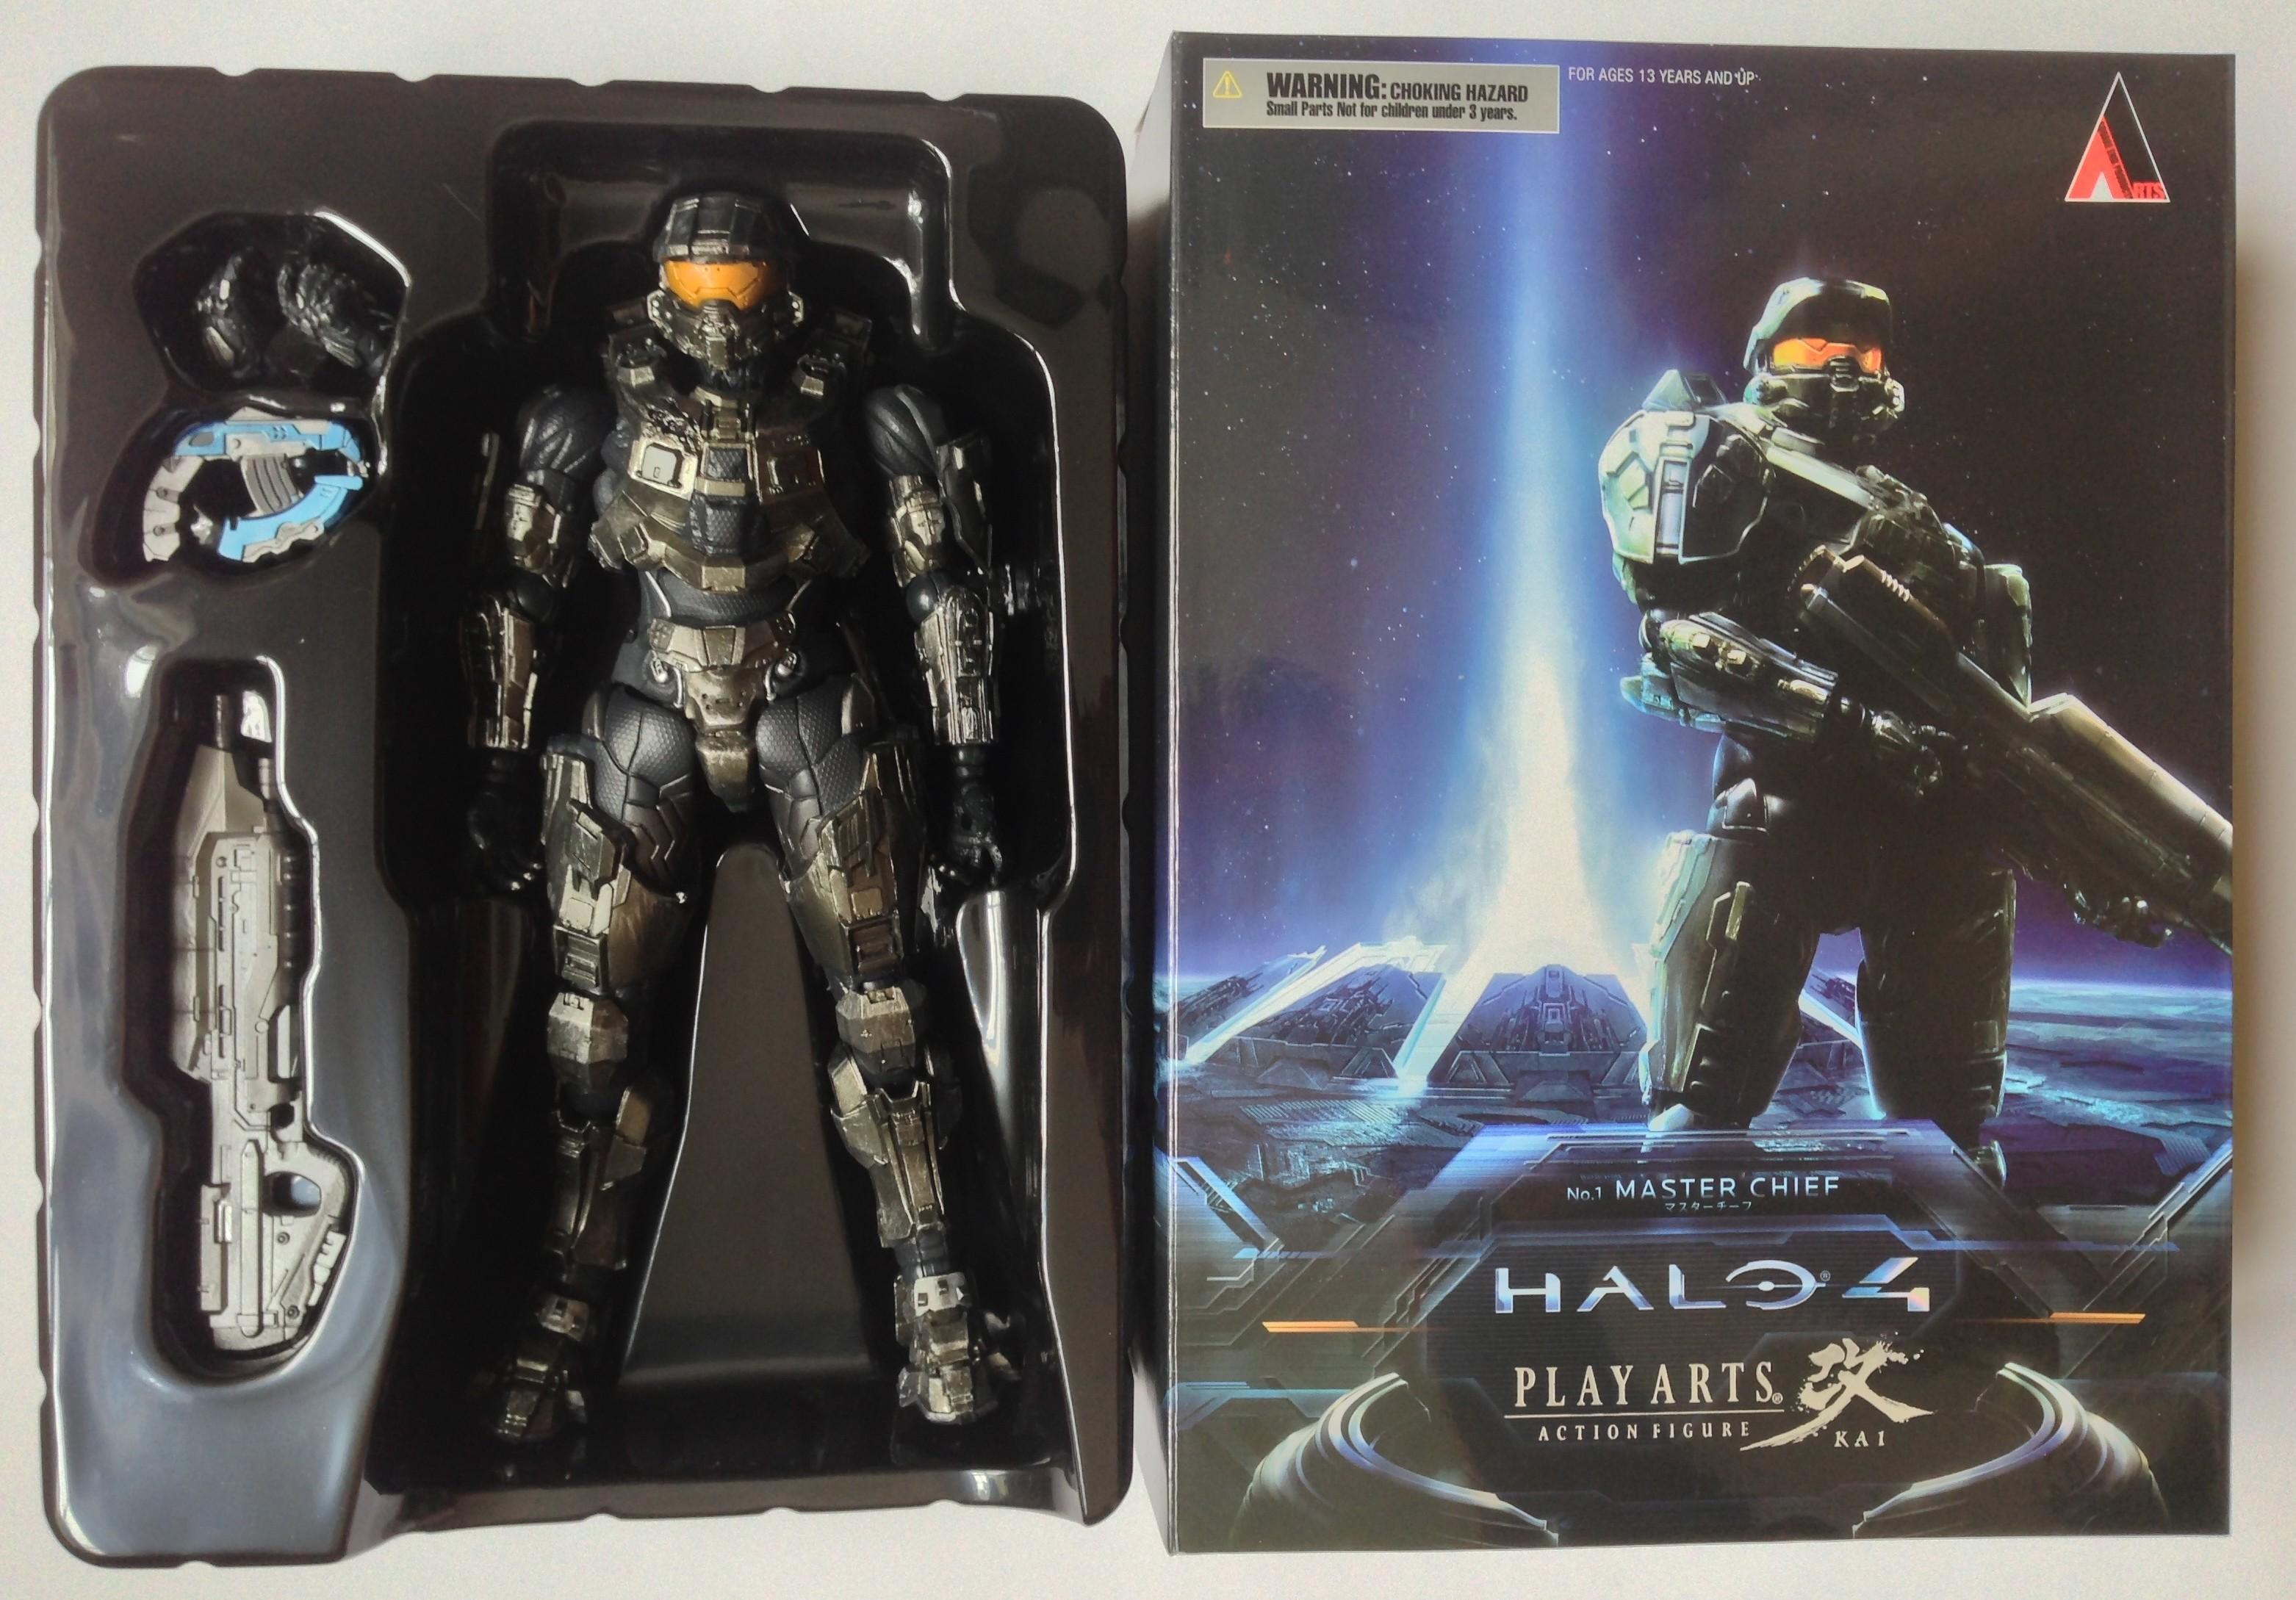 Halo 4 Play Arts Kai Master Chief Figure Review (Square-Enix